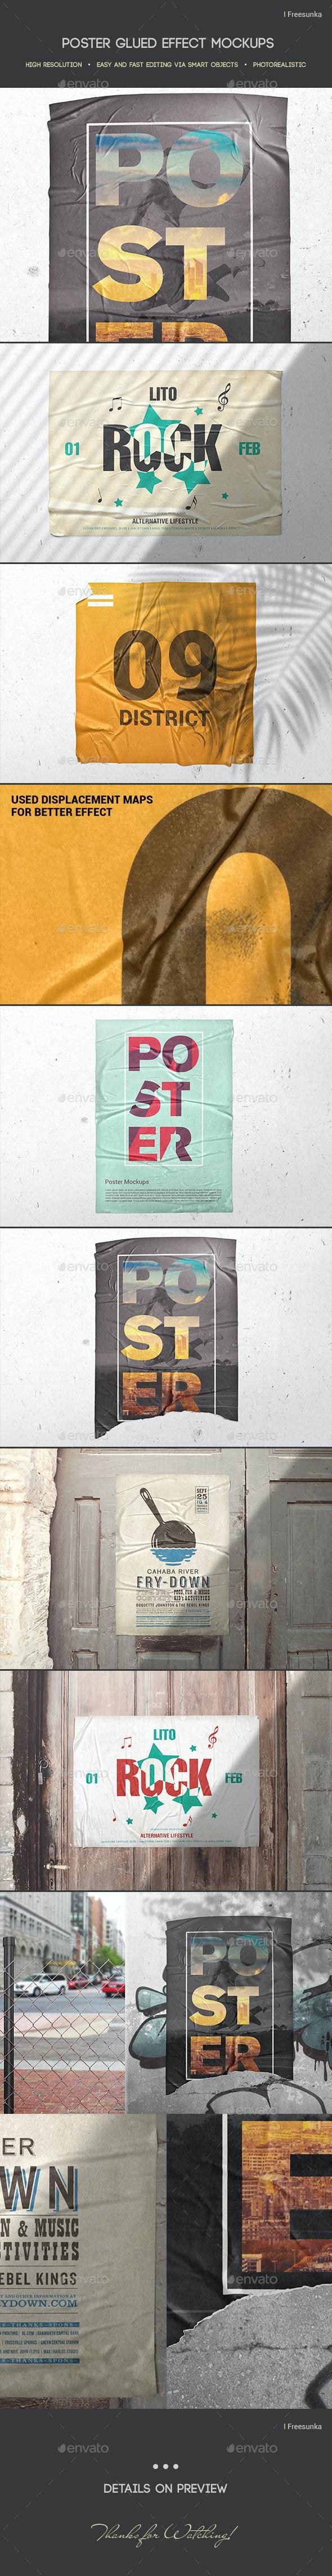 Poster Glued Effect Mockups - Posters Print